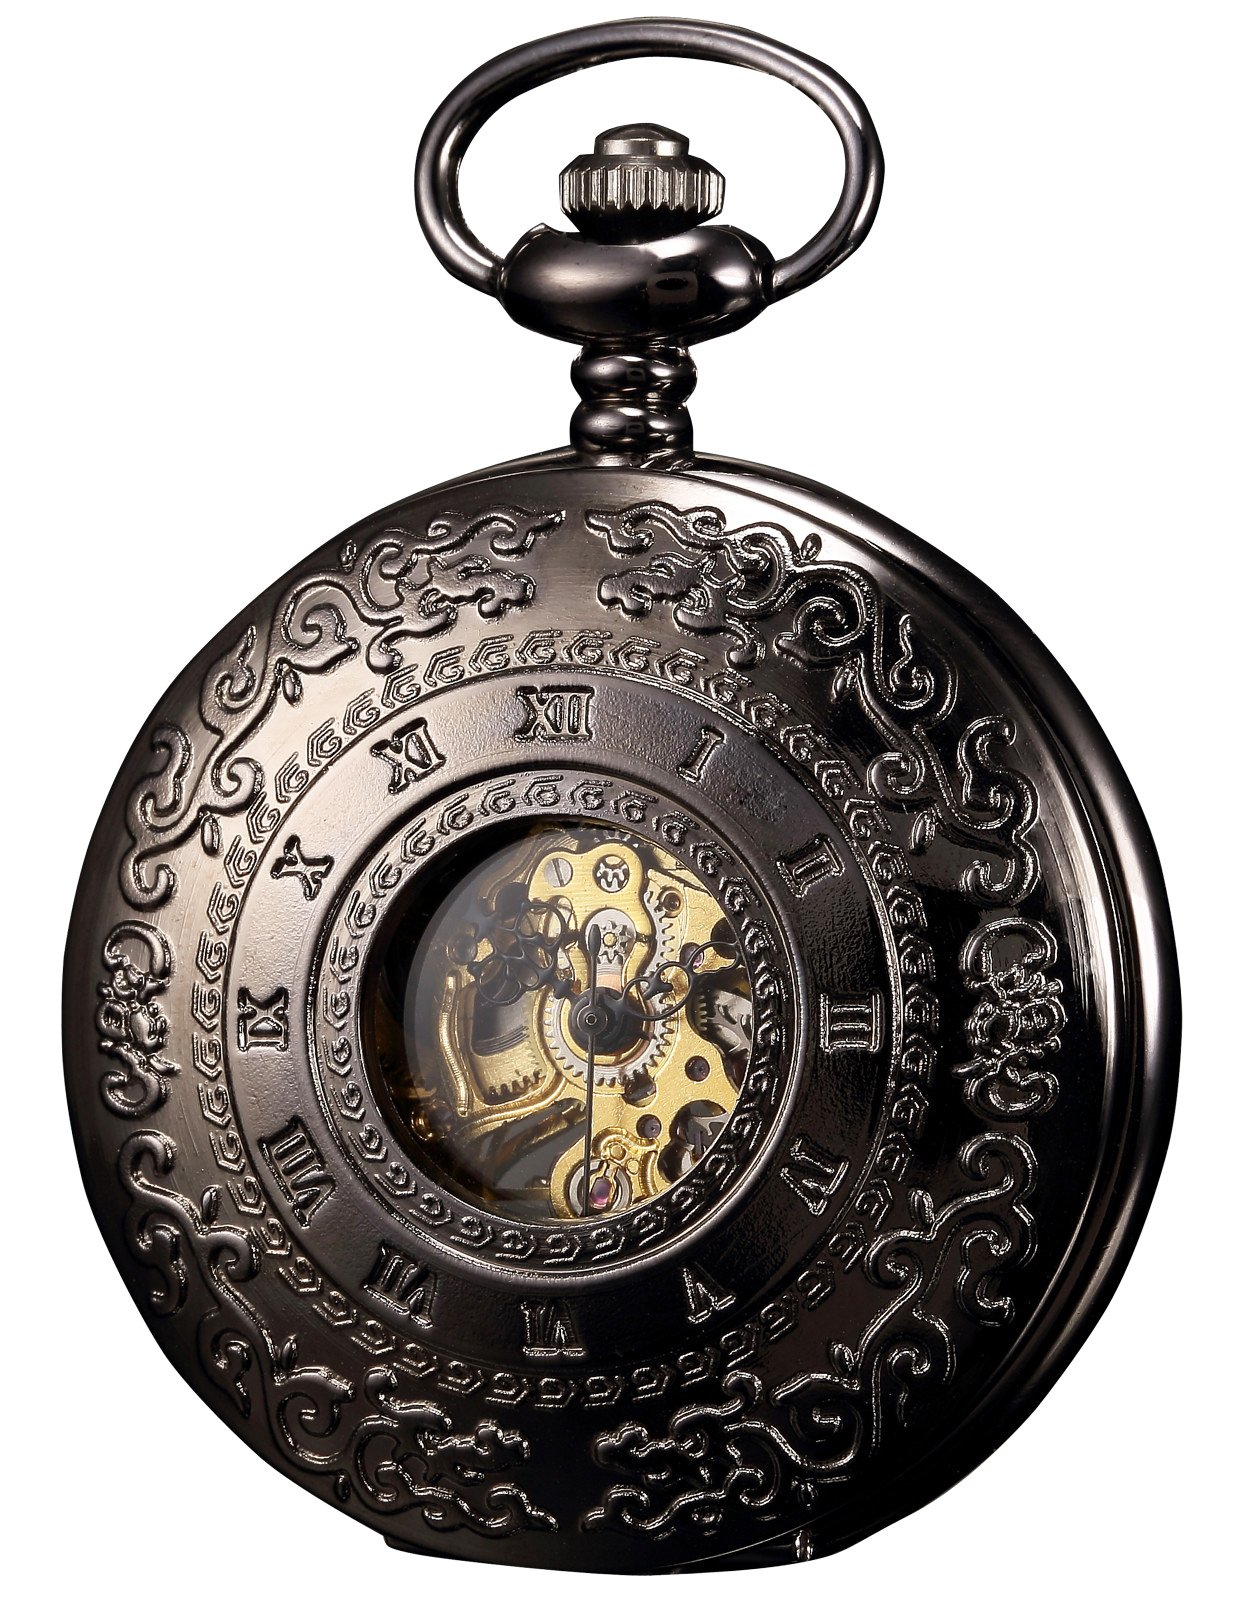 CDM product KS Half Hunter Mechanical Roman Numberals Half Hunter Antiqued Case Pocket Watch big image